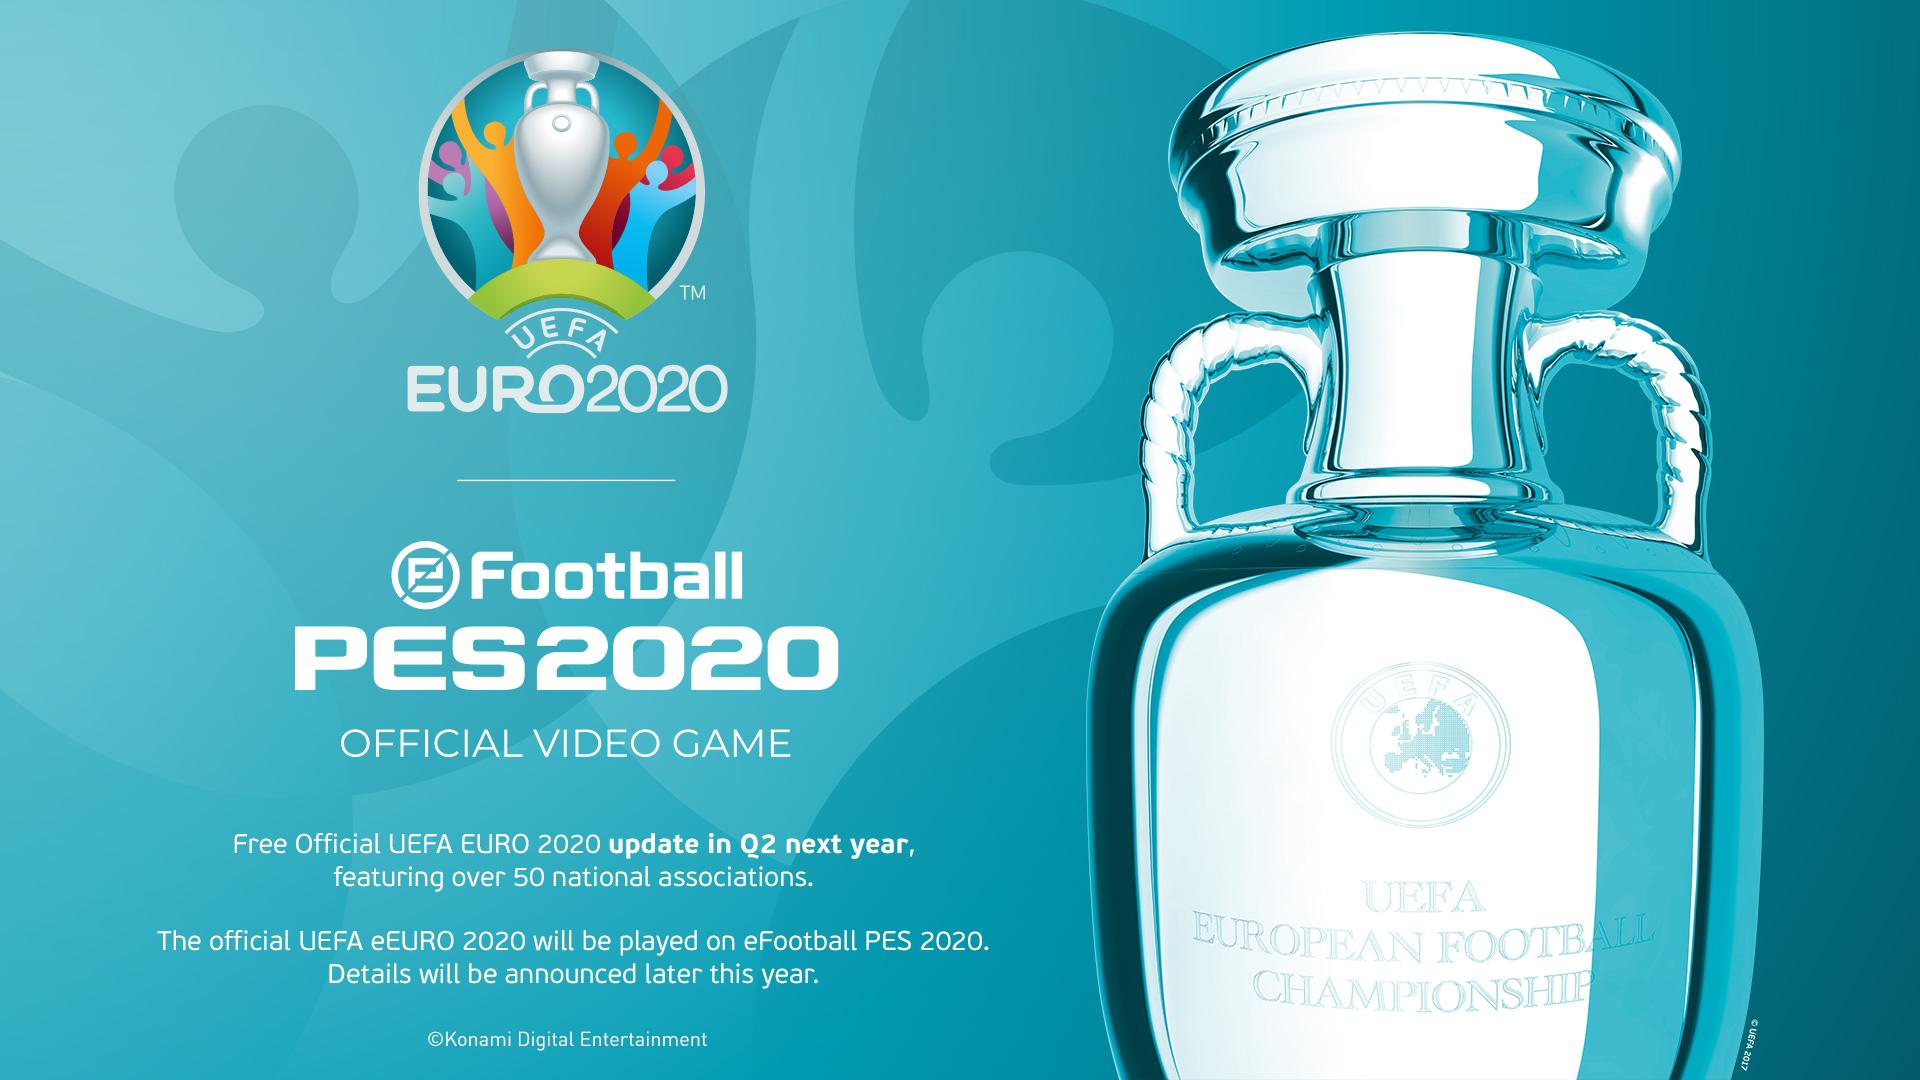 UEFA EURO2020 eFootball PES20202